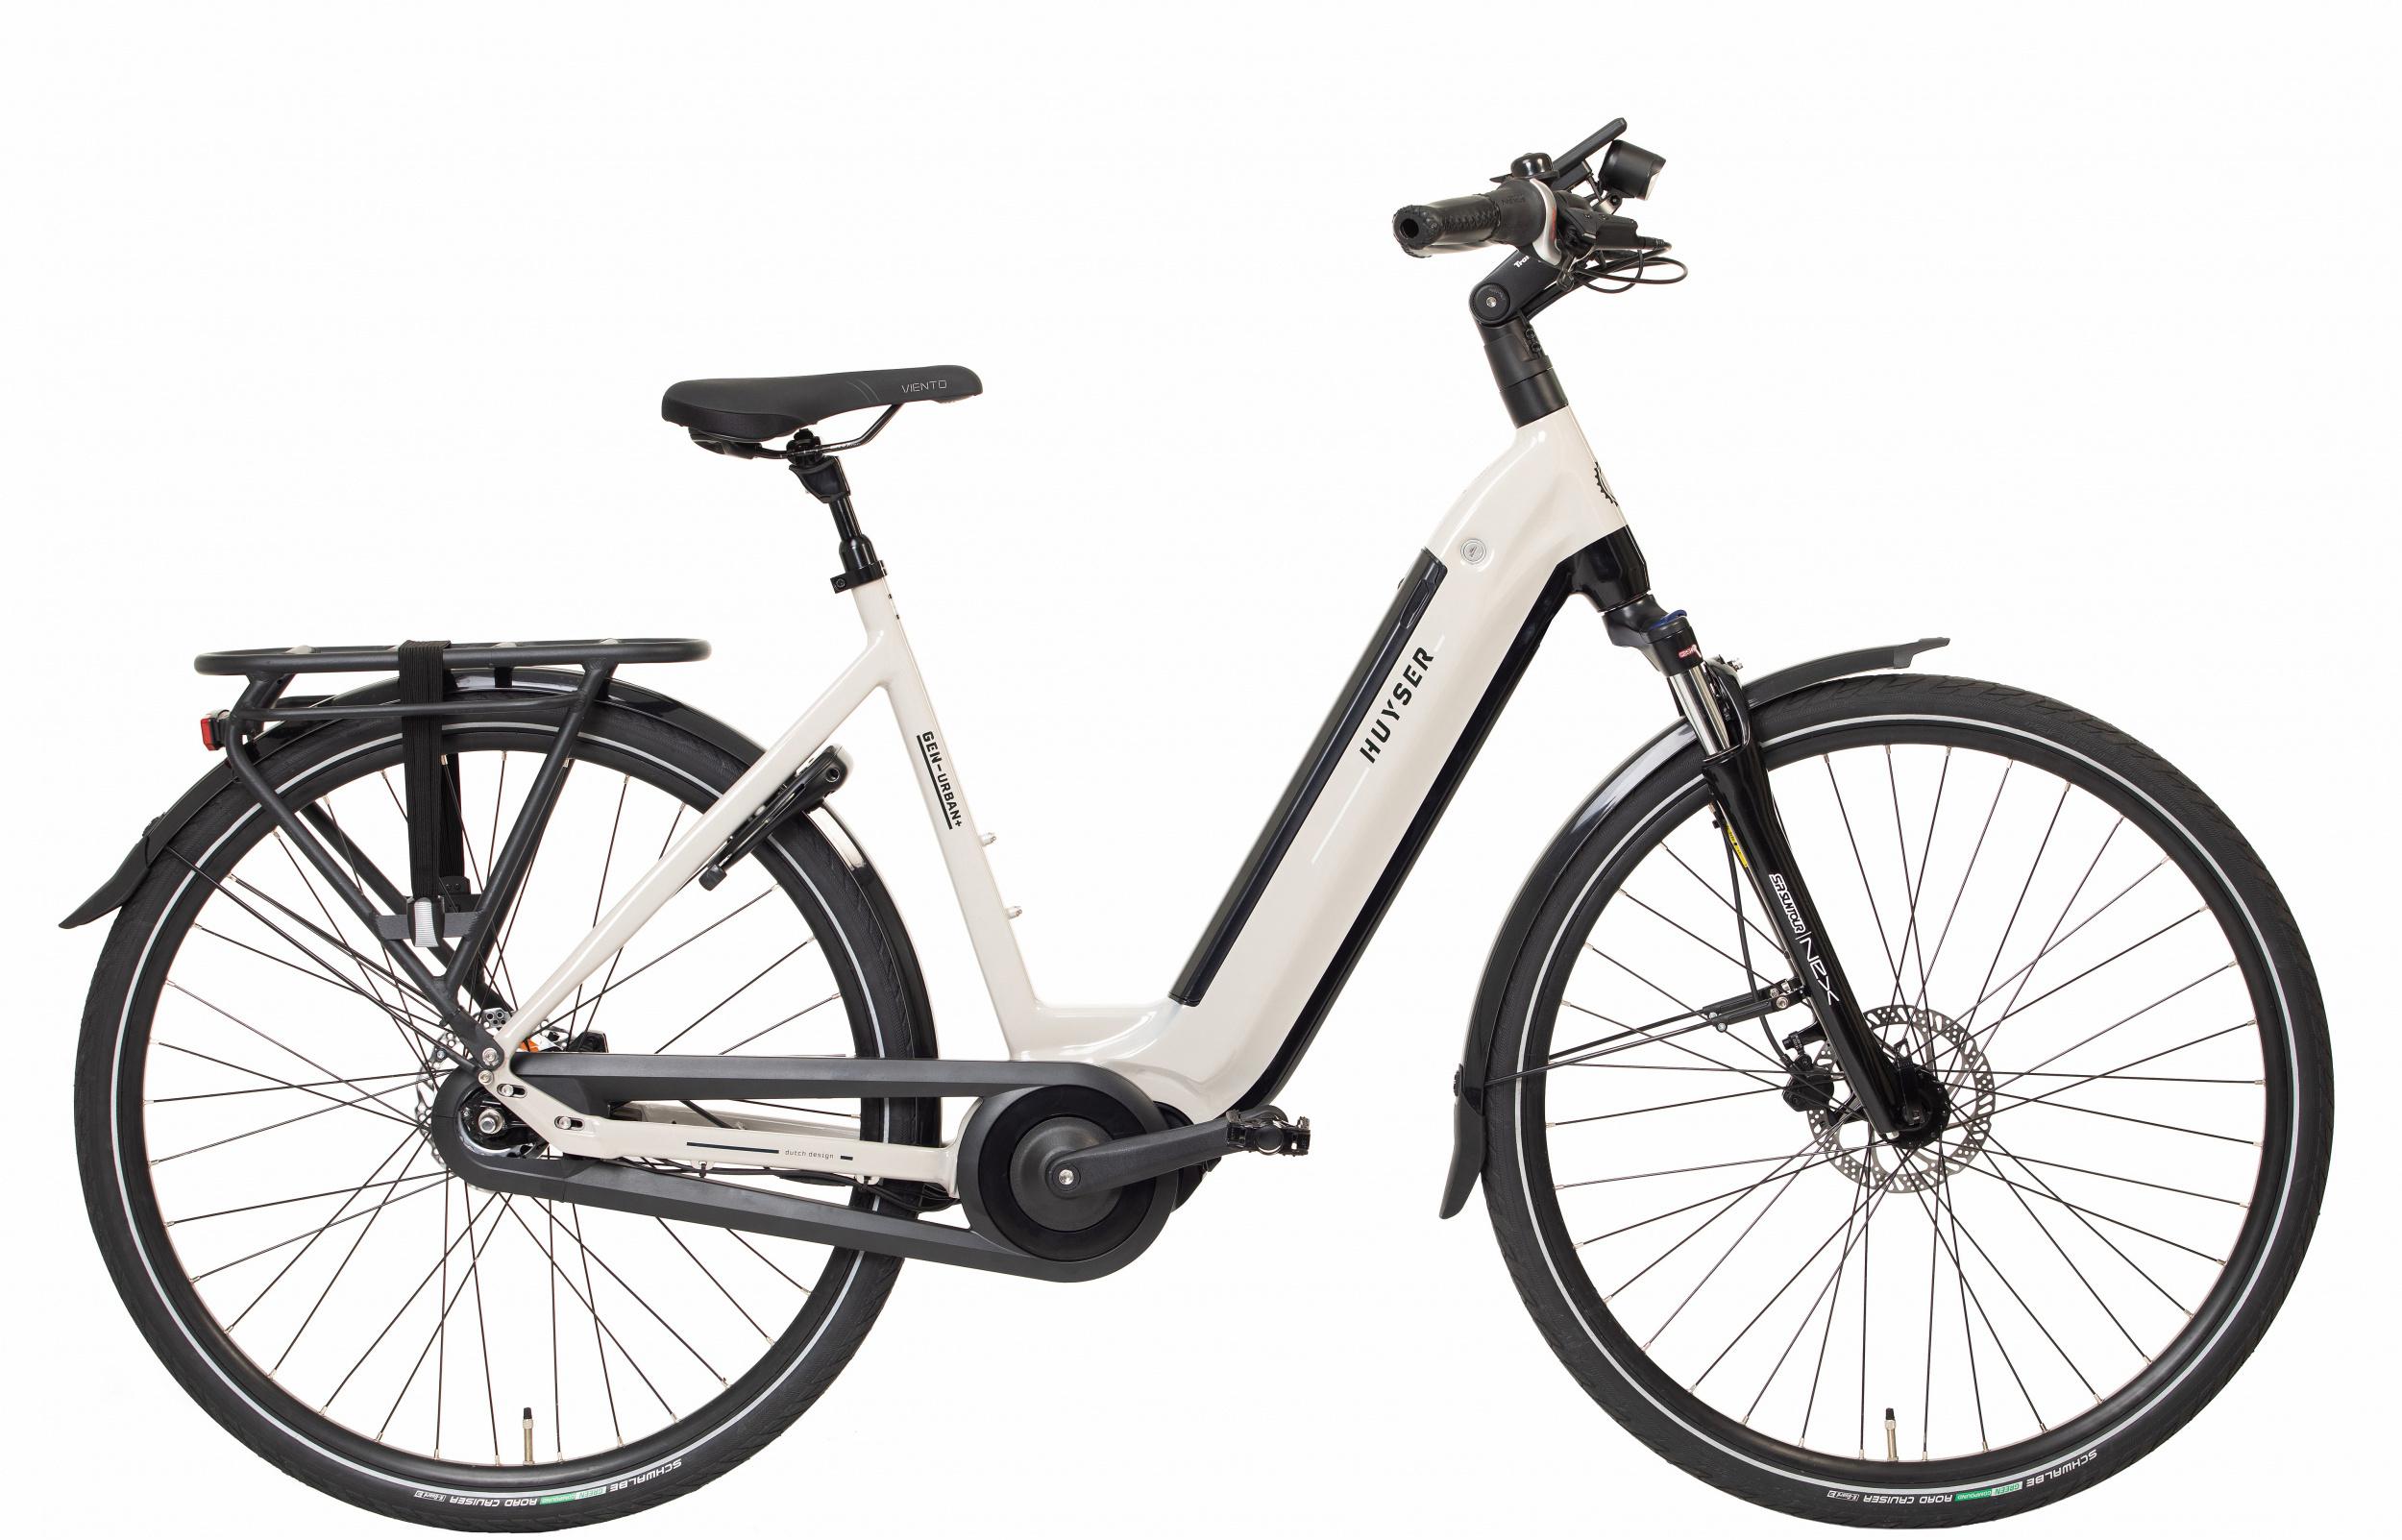 Huyser Gen Urban Plus elektrische fiets 7V met middenmotor